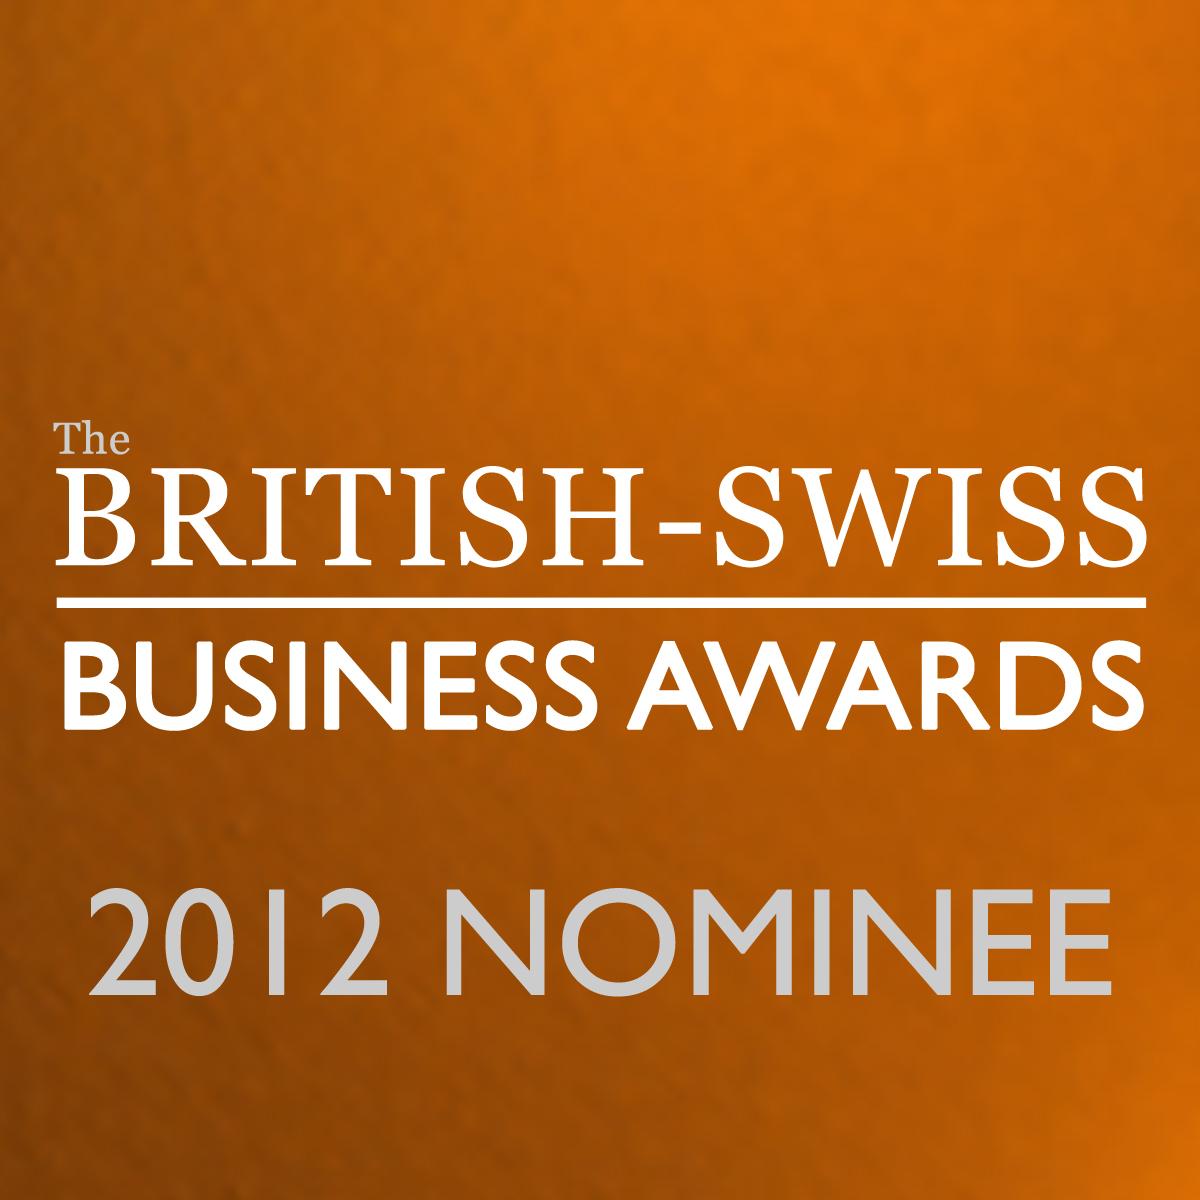 Nominee: The British-Swiss Business Awards